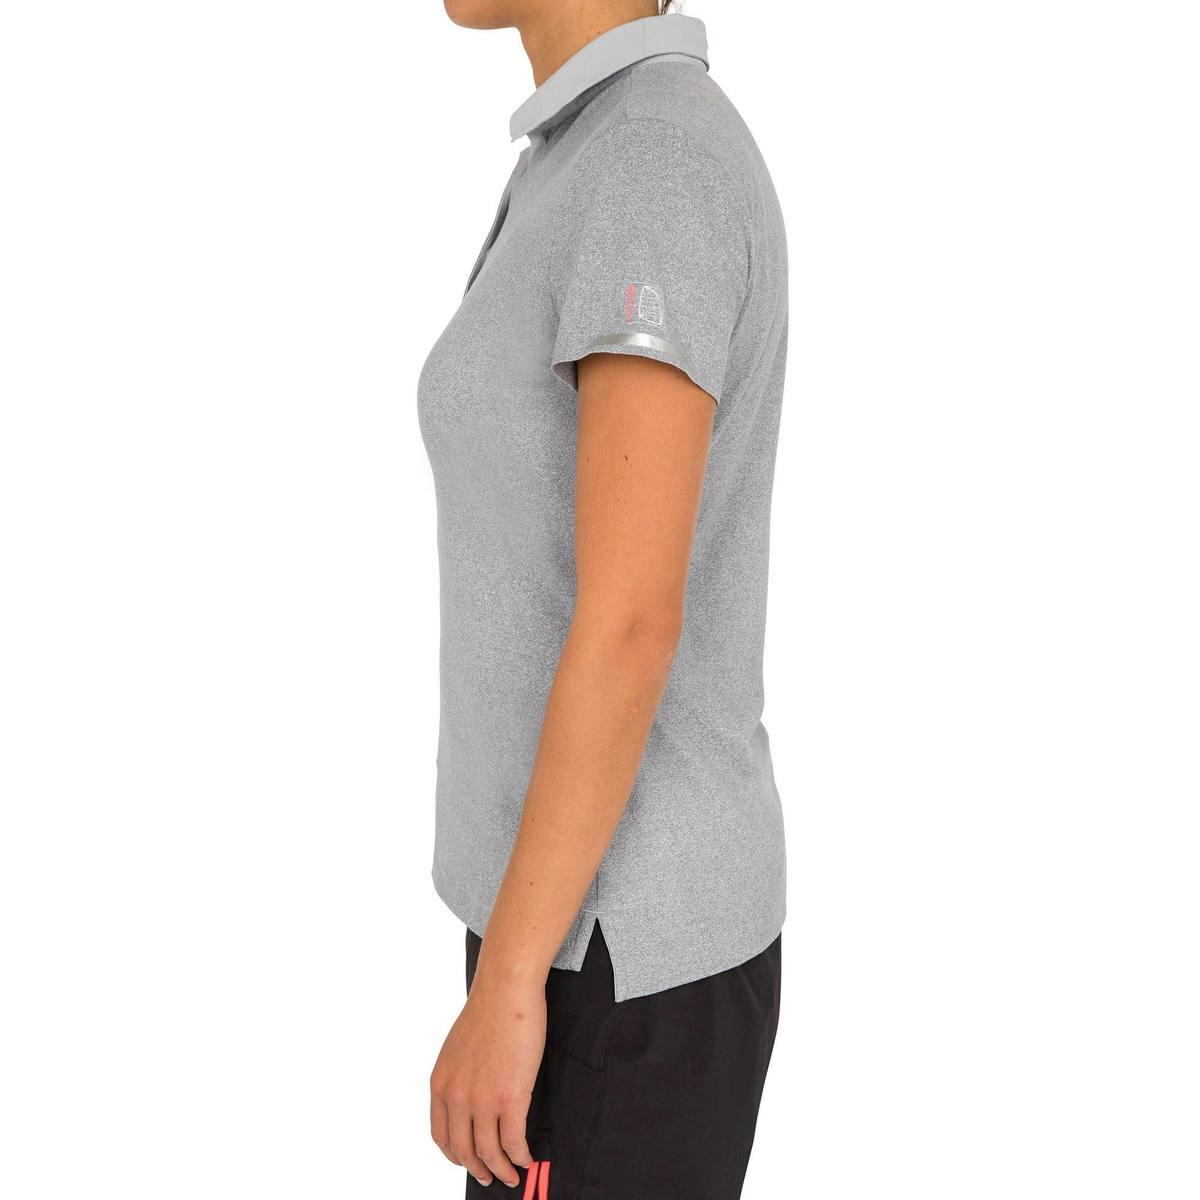 Bild 3 von Poloshirt kurzarm Segeln Race Damen grau